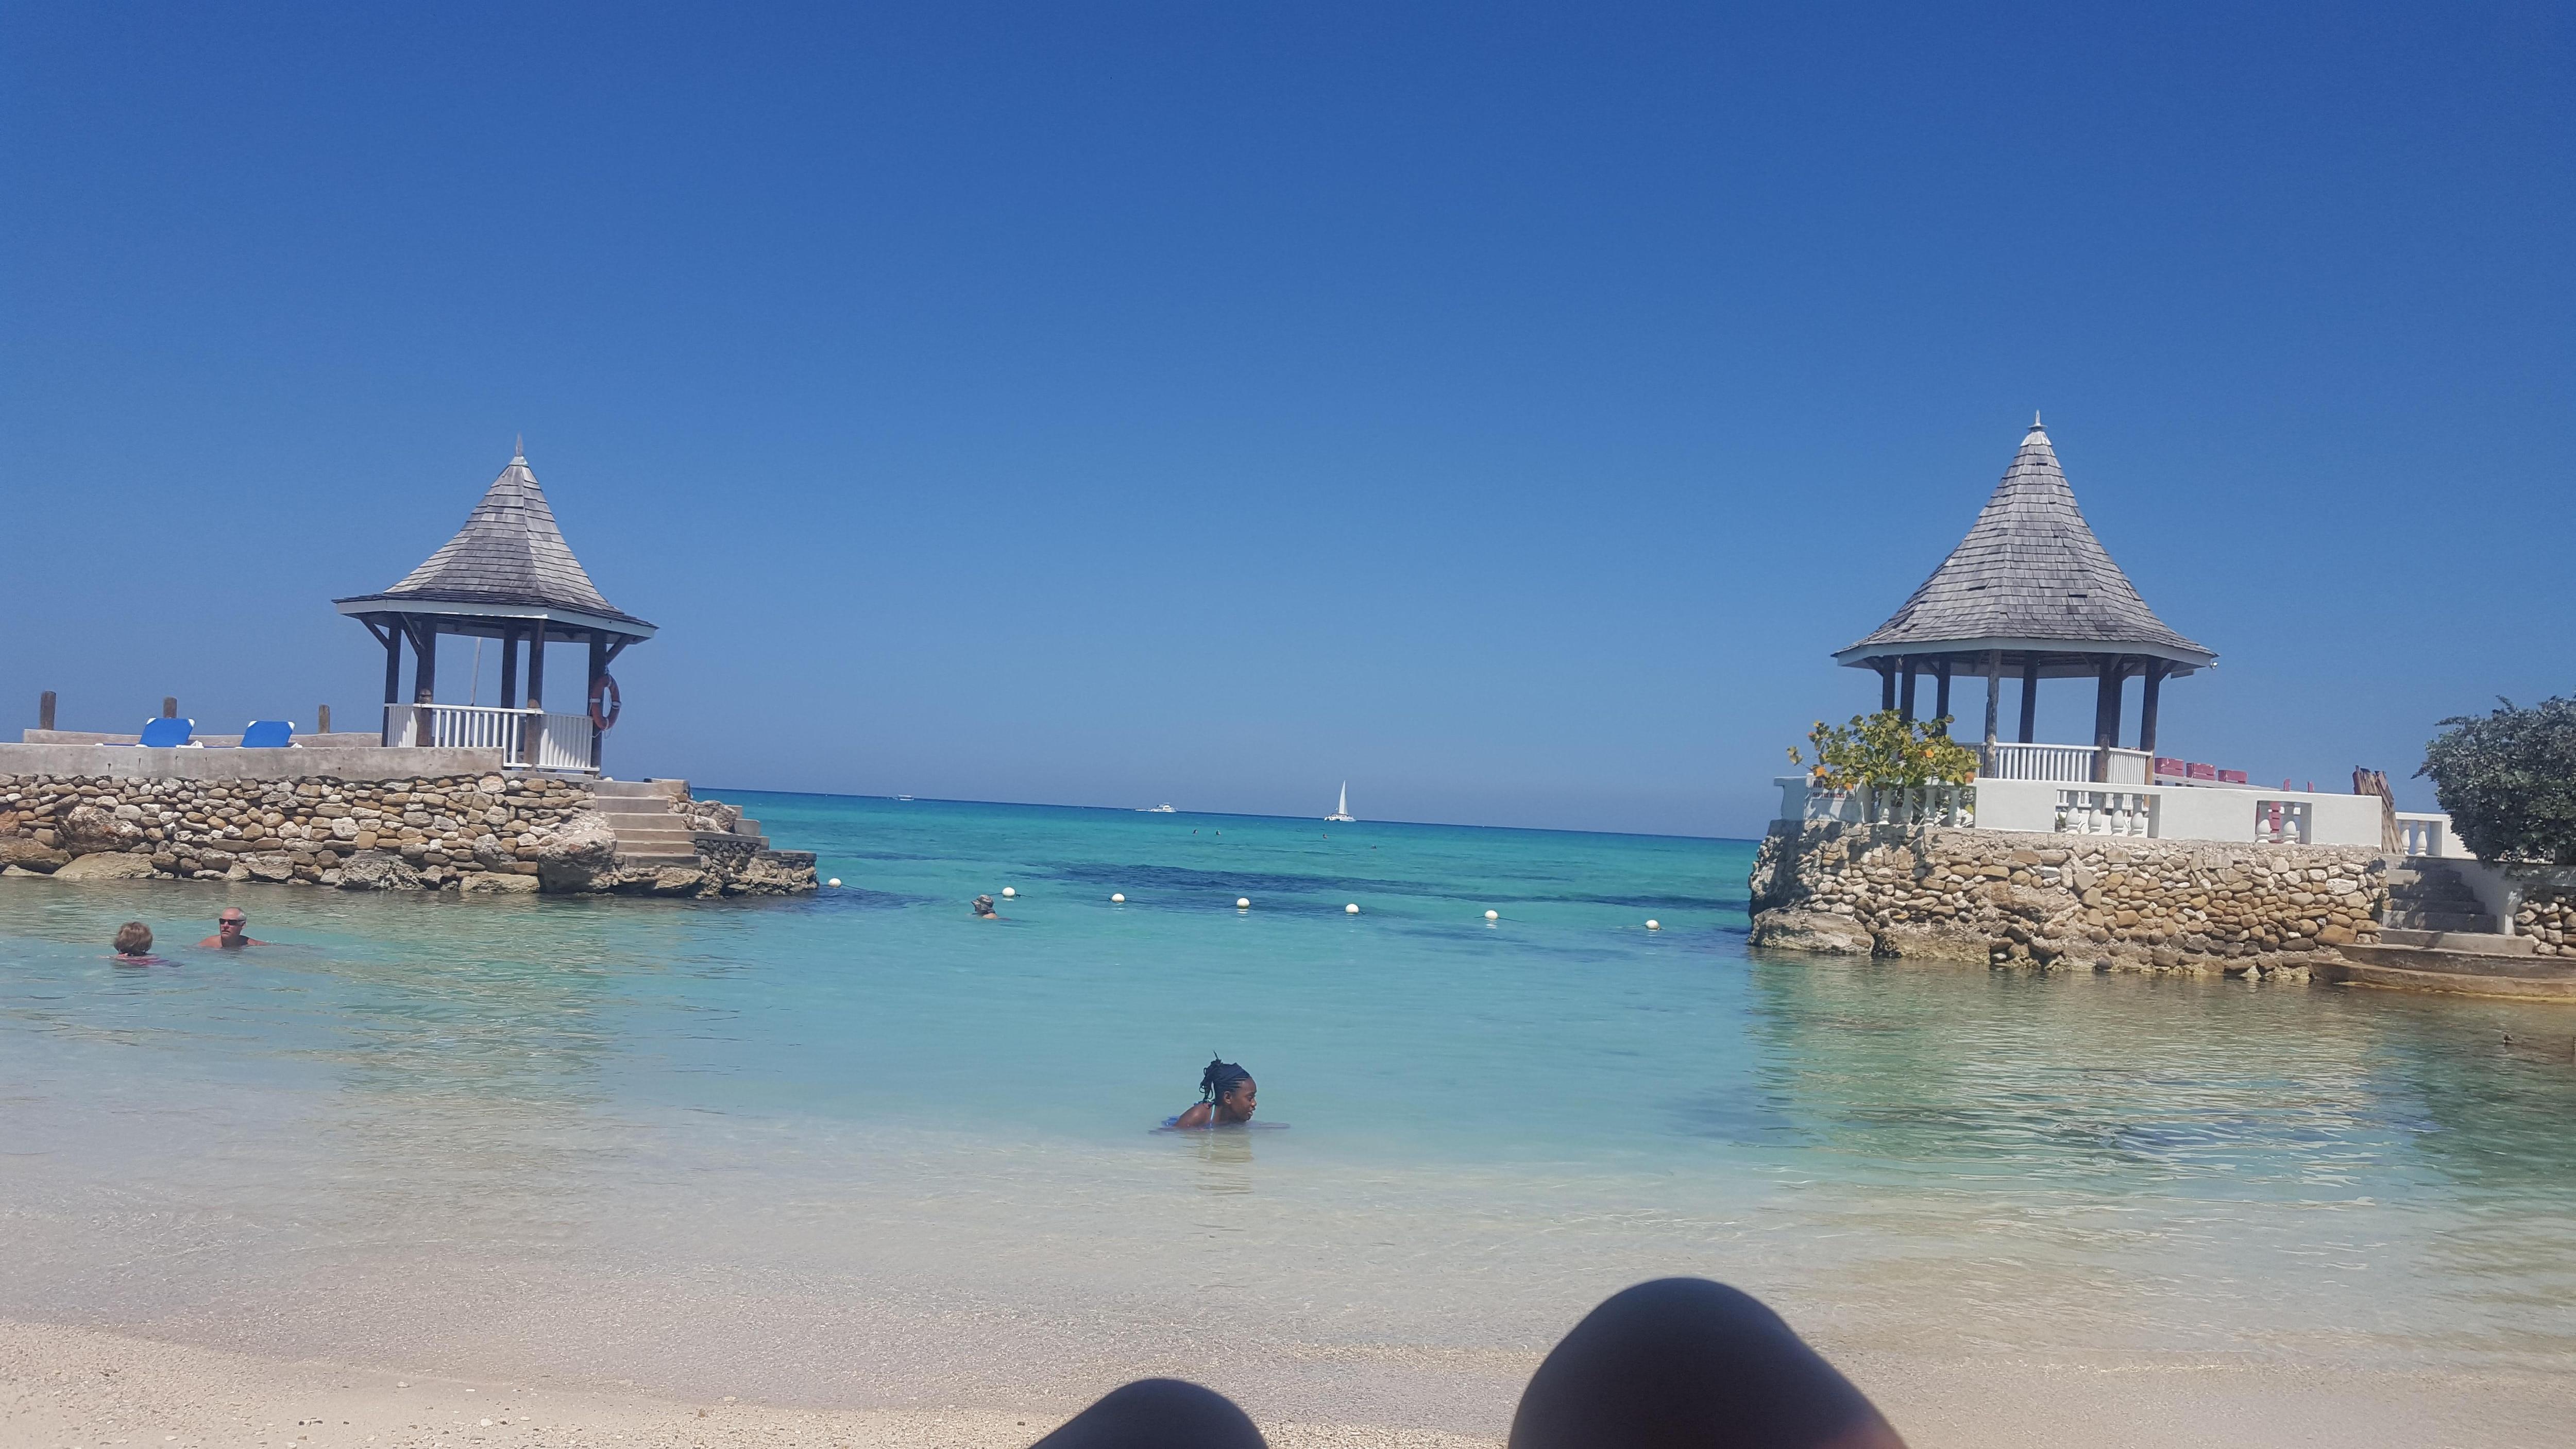 Seagarden Beach Resort All Inclusive Montego Bay Room Prices Reviews Travelocity